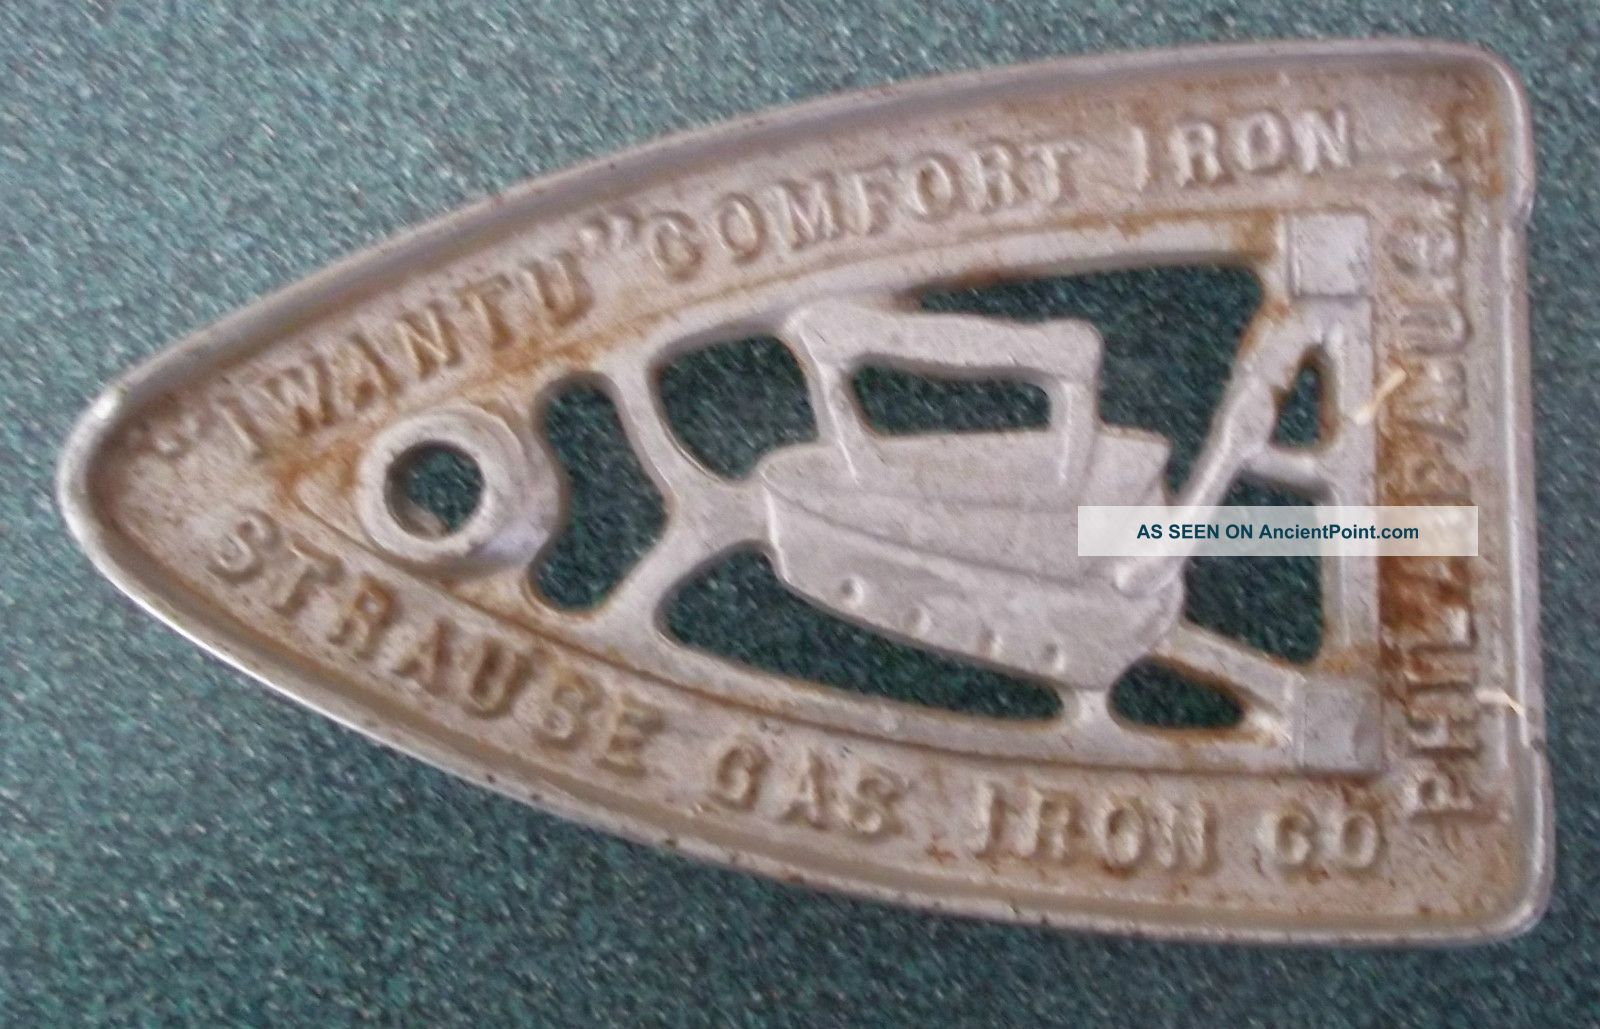 Antique Strause Gas Trivet; Sad Iron Rest Trivets photo